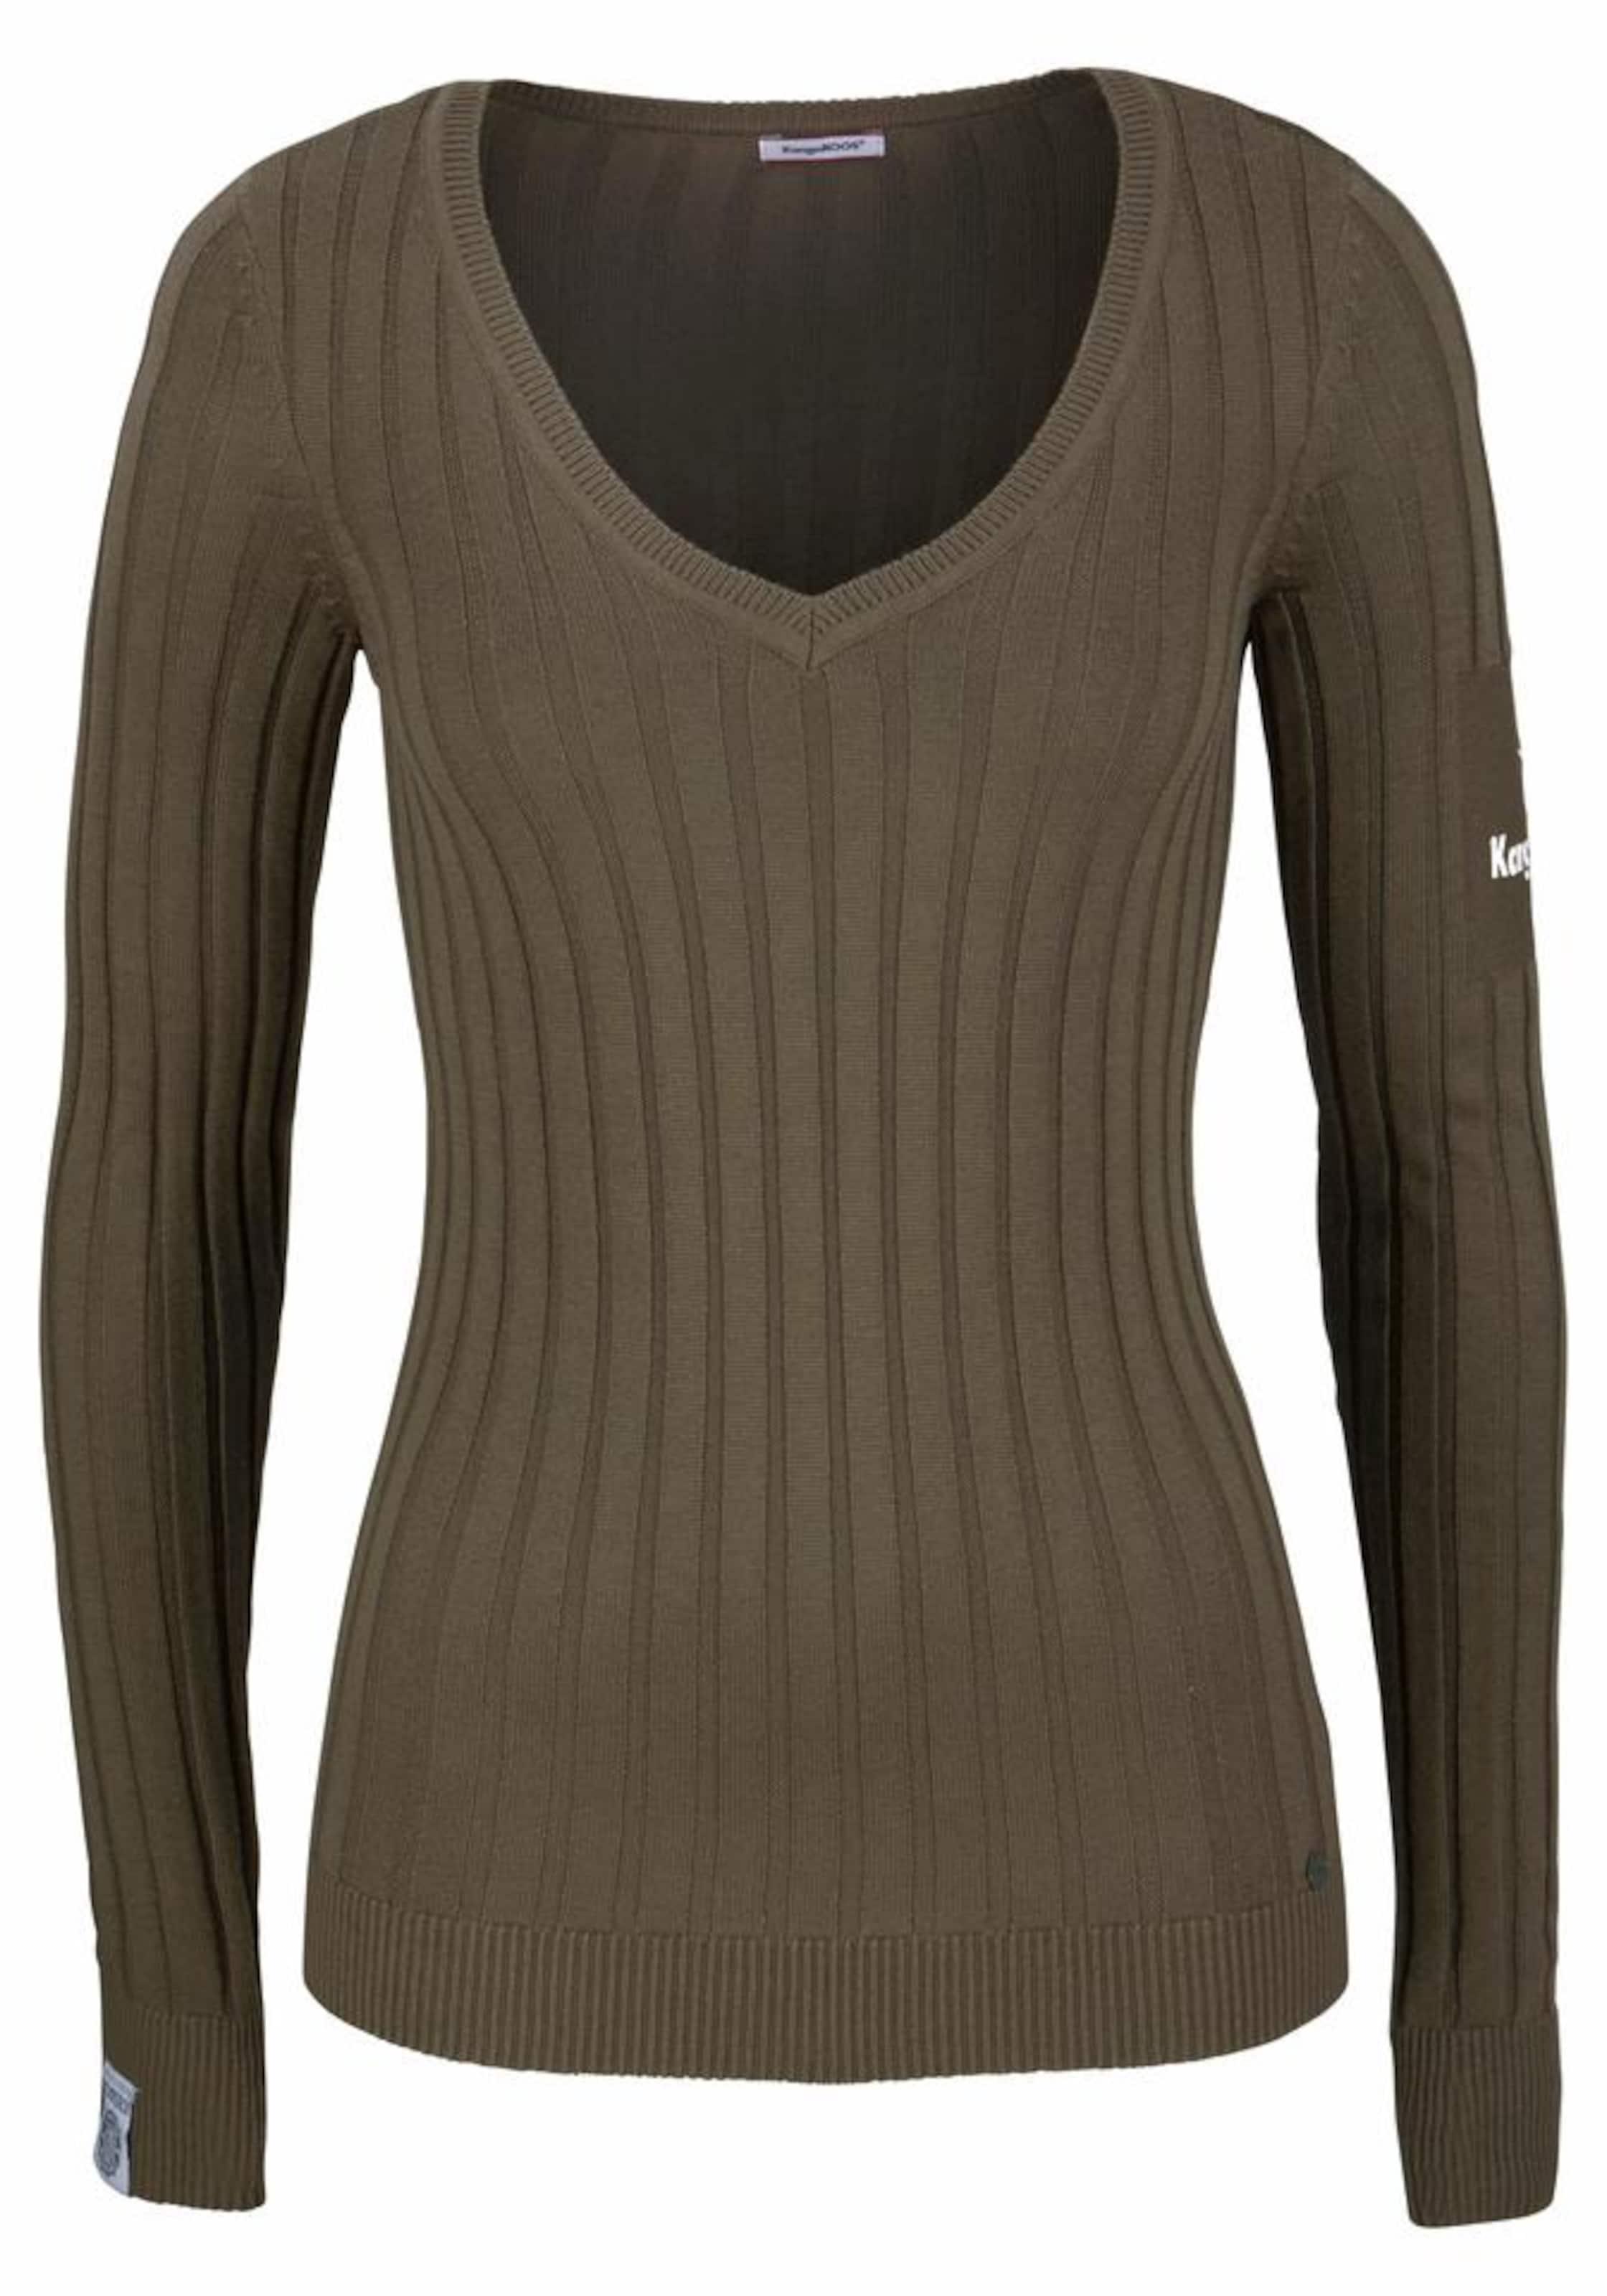 ausschnitt Khaki V In pullover Kangaroos qRL54j3A